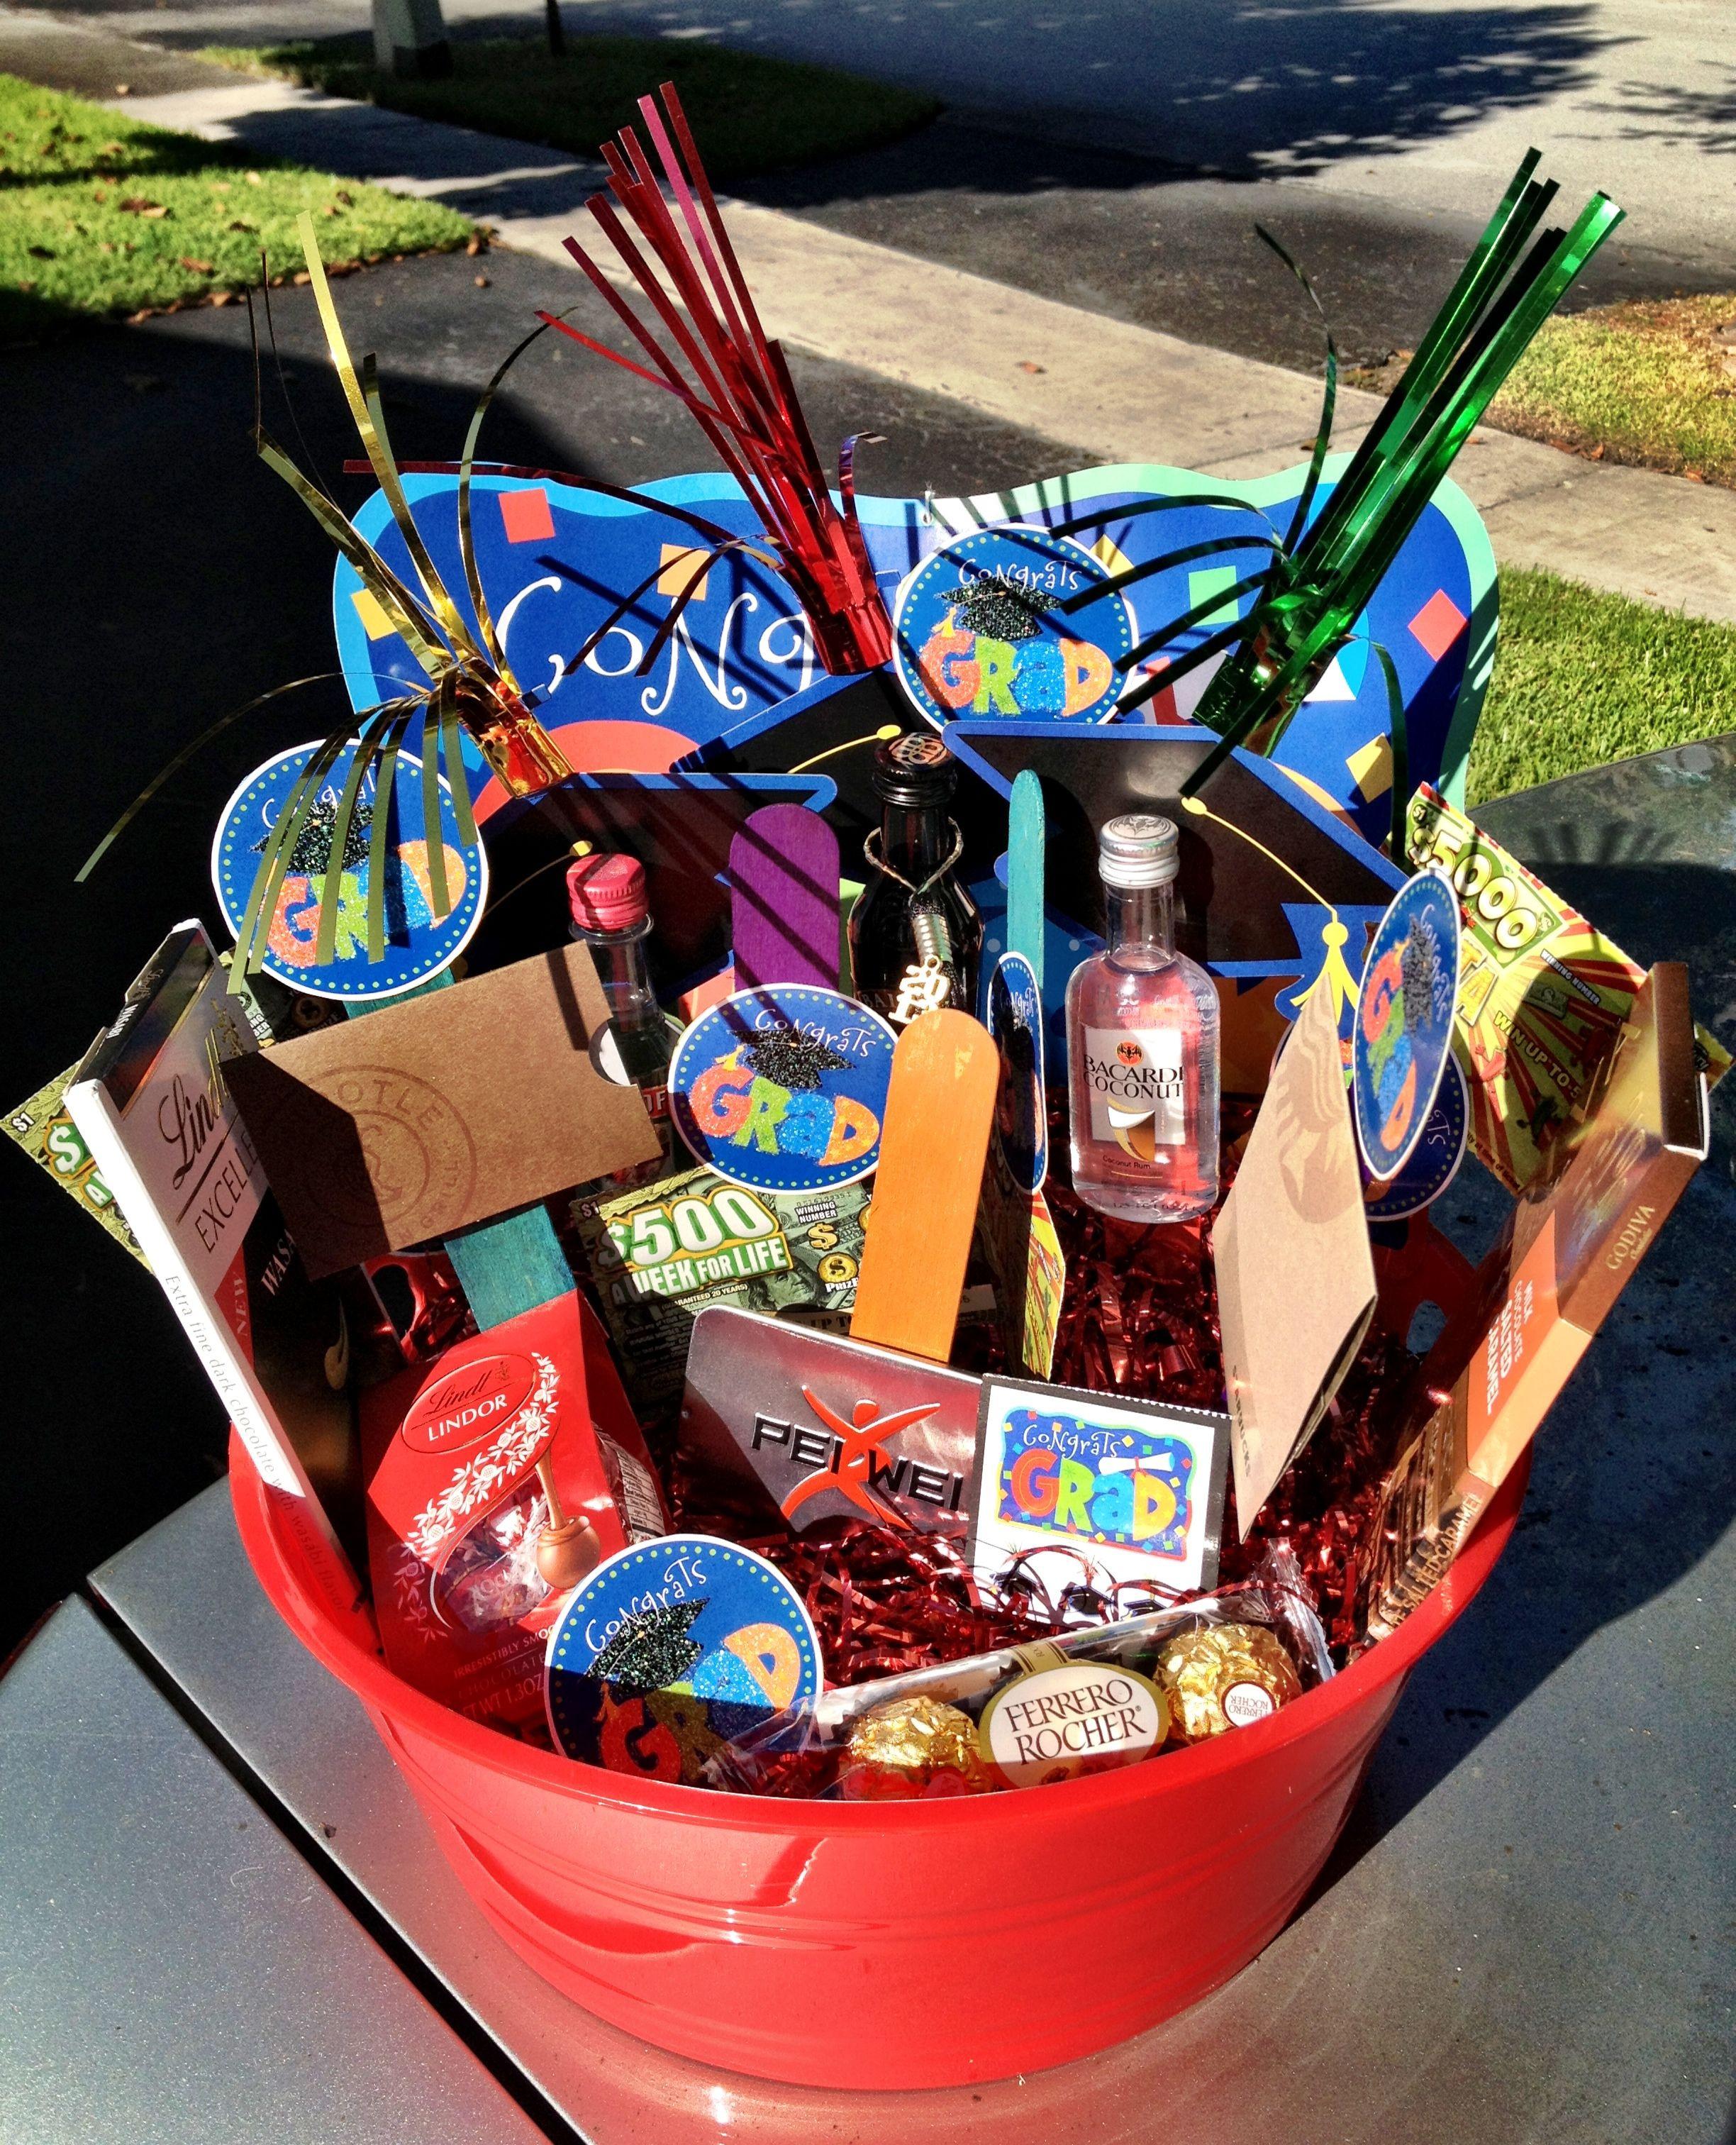 Homemade Graduation Gift Basket Ideas  graduation t basket DIY decorative basket floral